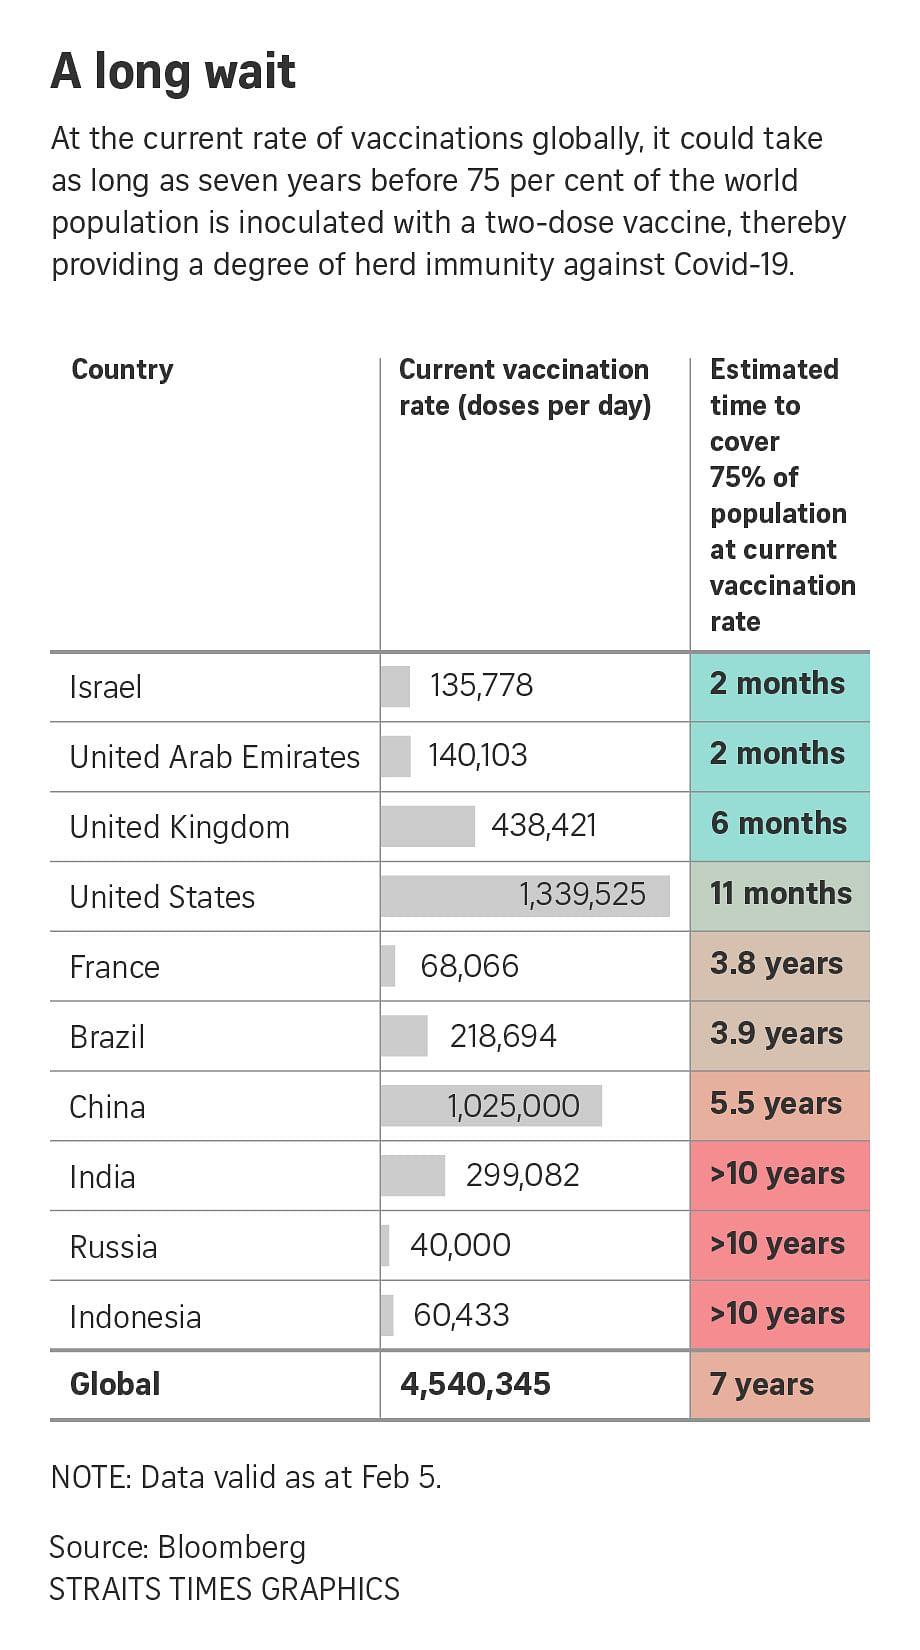 Dalam sebuah riset yang dikeluarkan oleh Bloomberg, pandemi covid-19 secara global diperkirakan baru akan sepenuhnya selesai 7 tahun lagi. Tepatnya pada tahun 2028 mendatang.